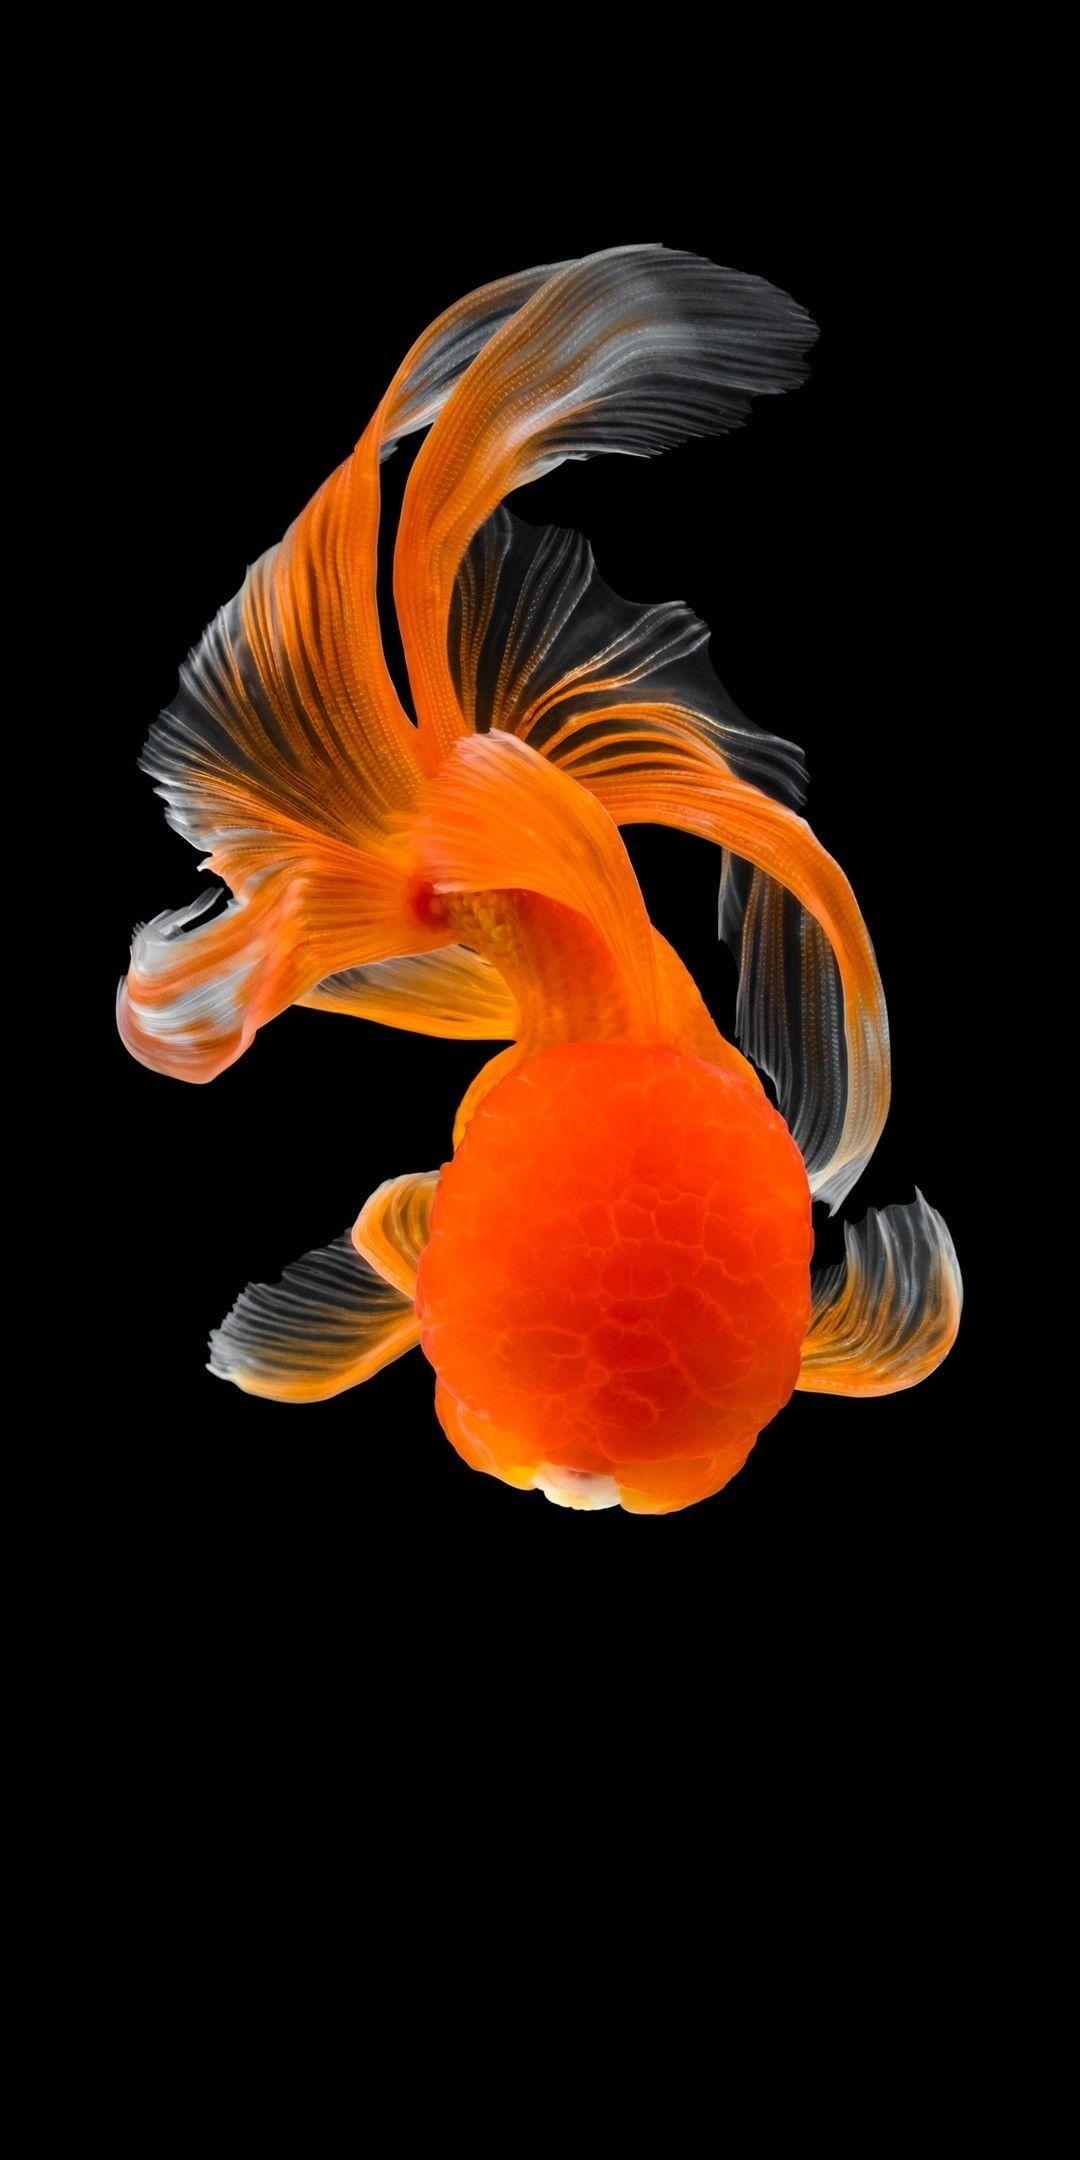 Pin By Nacruz On Zhiteli Morej I Okeanov In 2020 Goldfish Fish Wallpaper Cool Fish